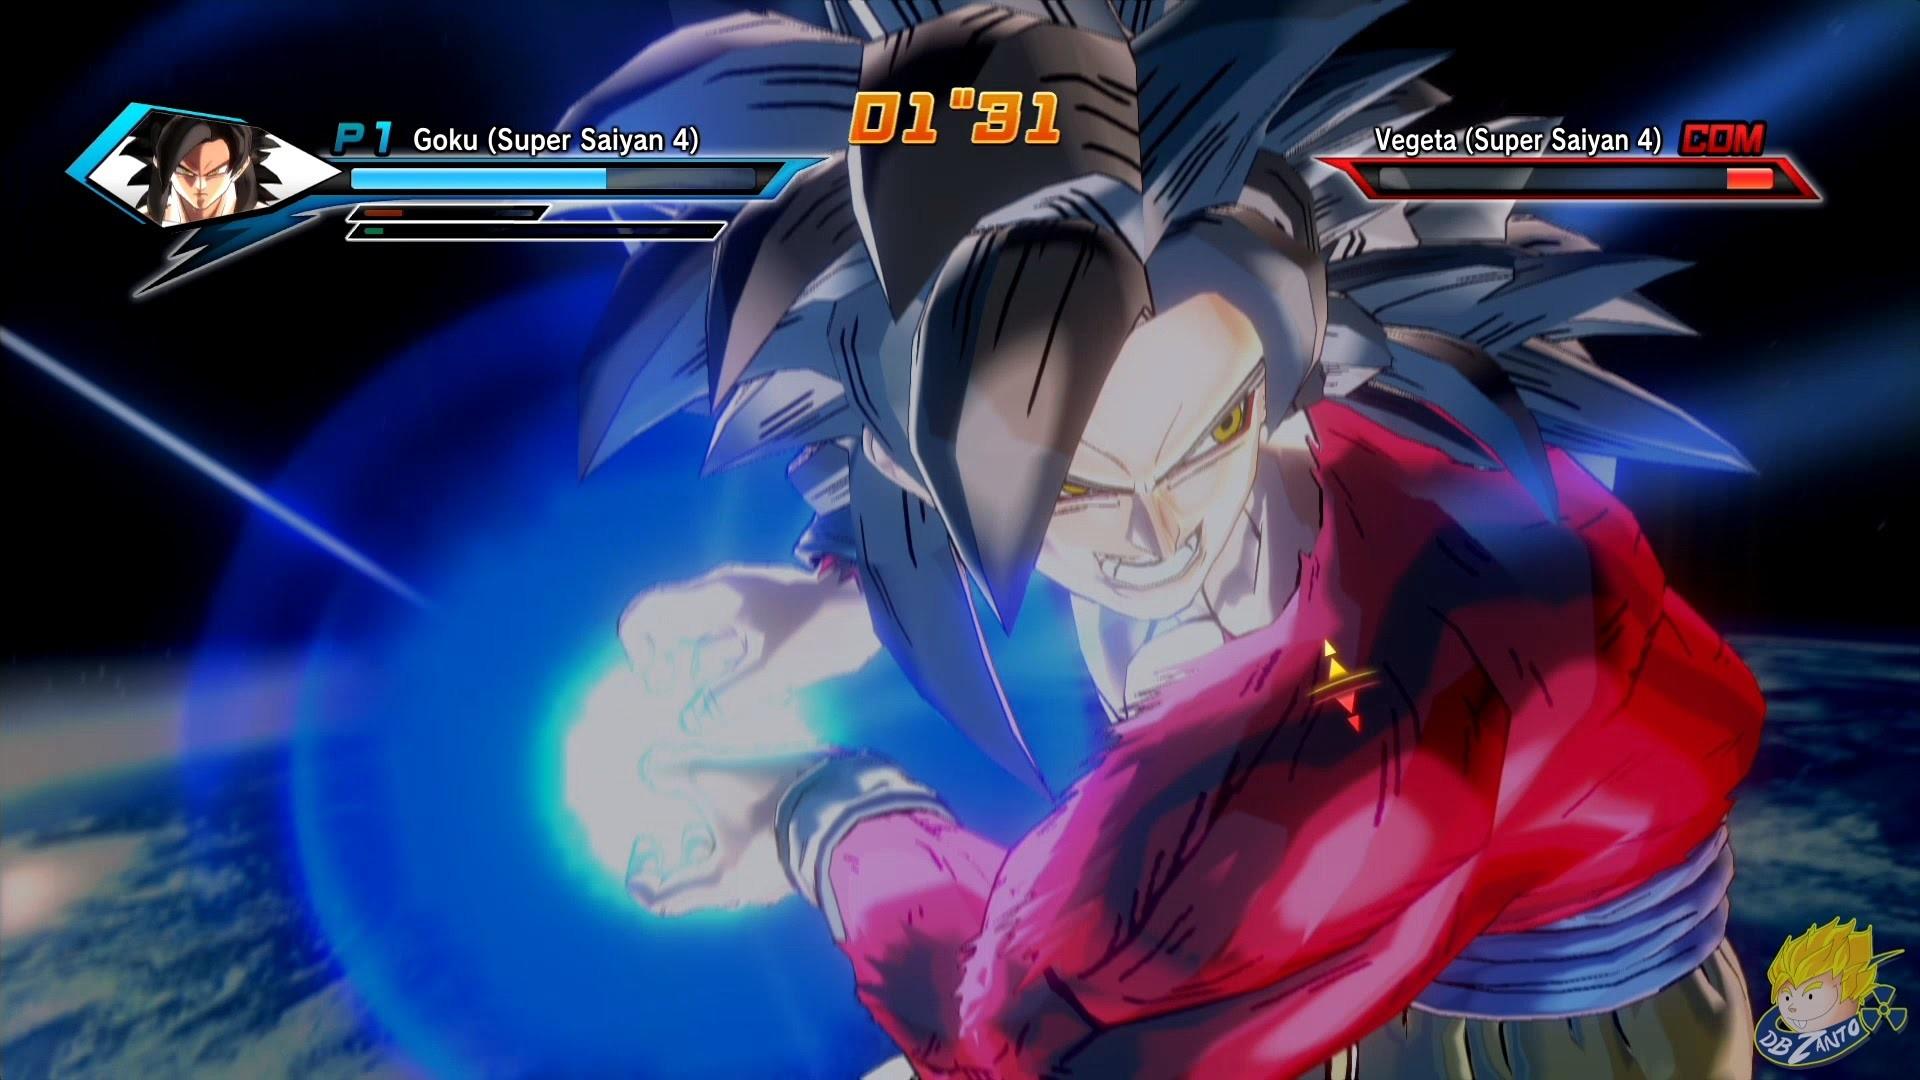 Dragon Ball Xenoverse (PS4) : SSJ4 Goku Vs SSJ4 Vegeta【60FPS 1080P】 –  YouTube